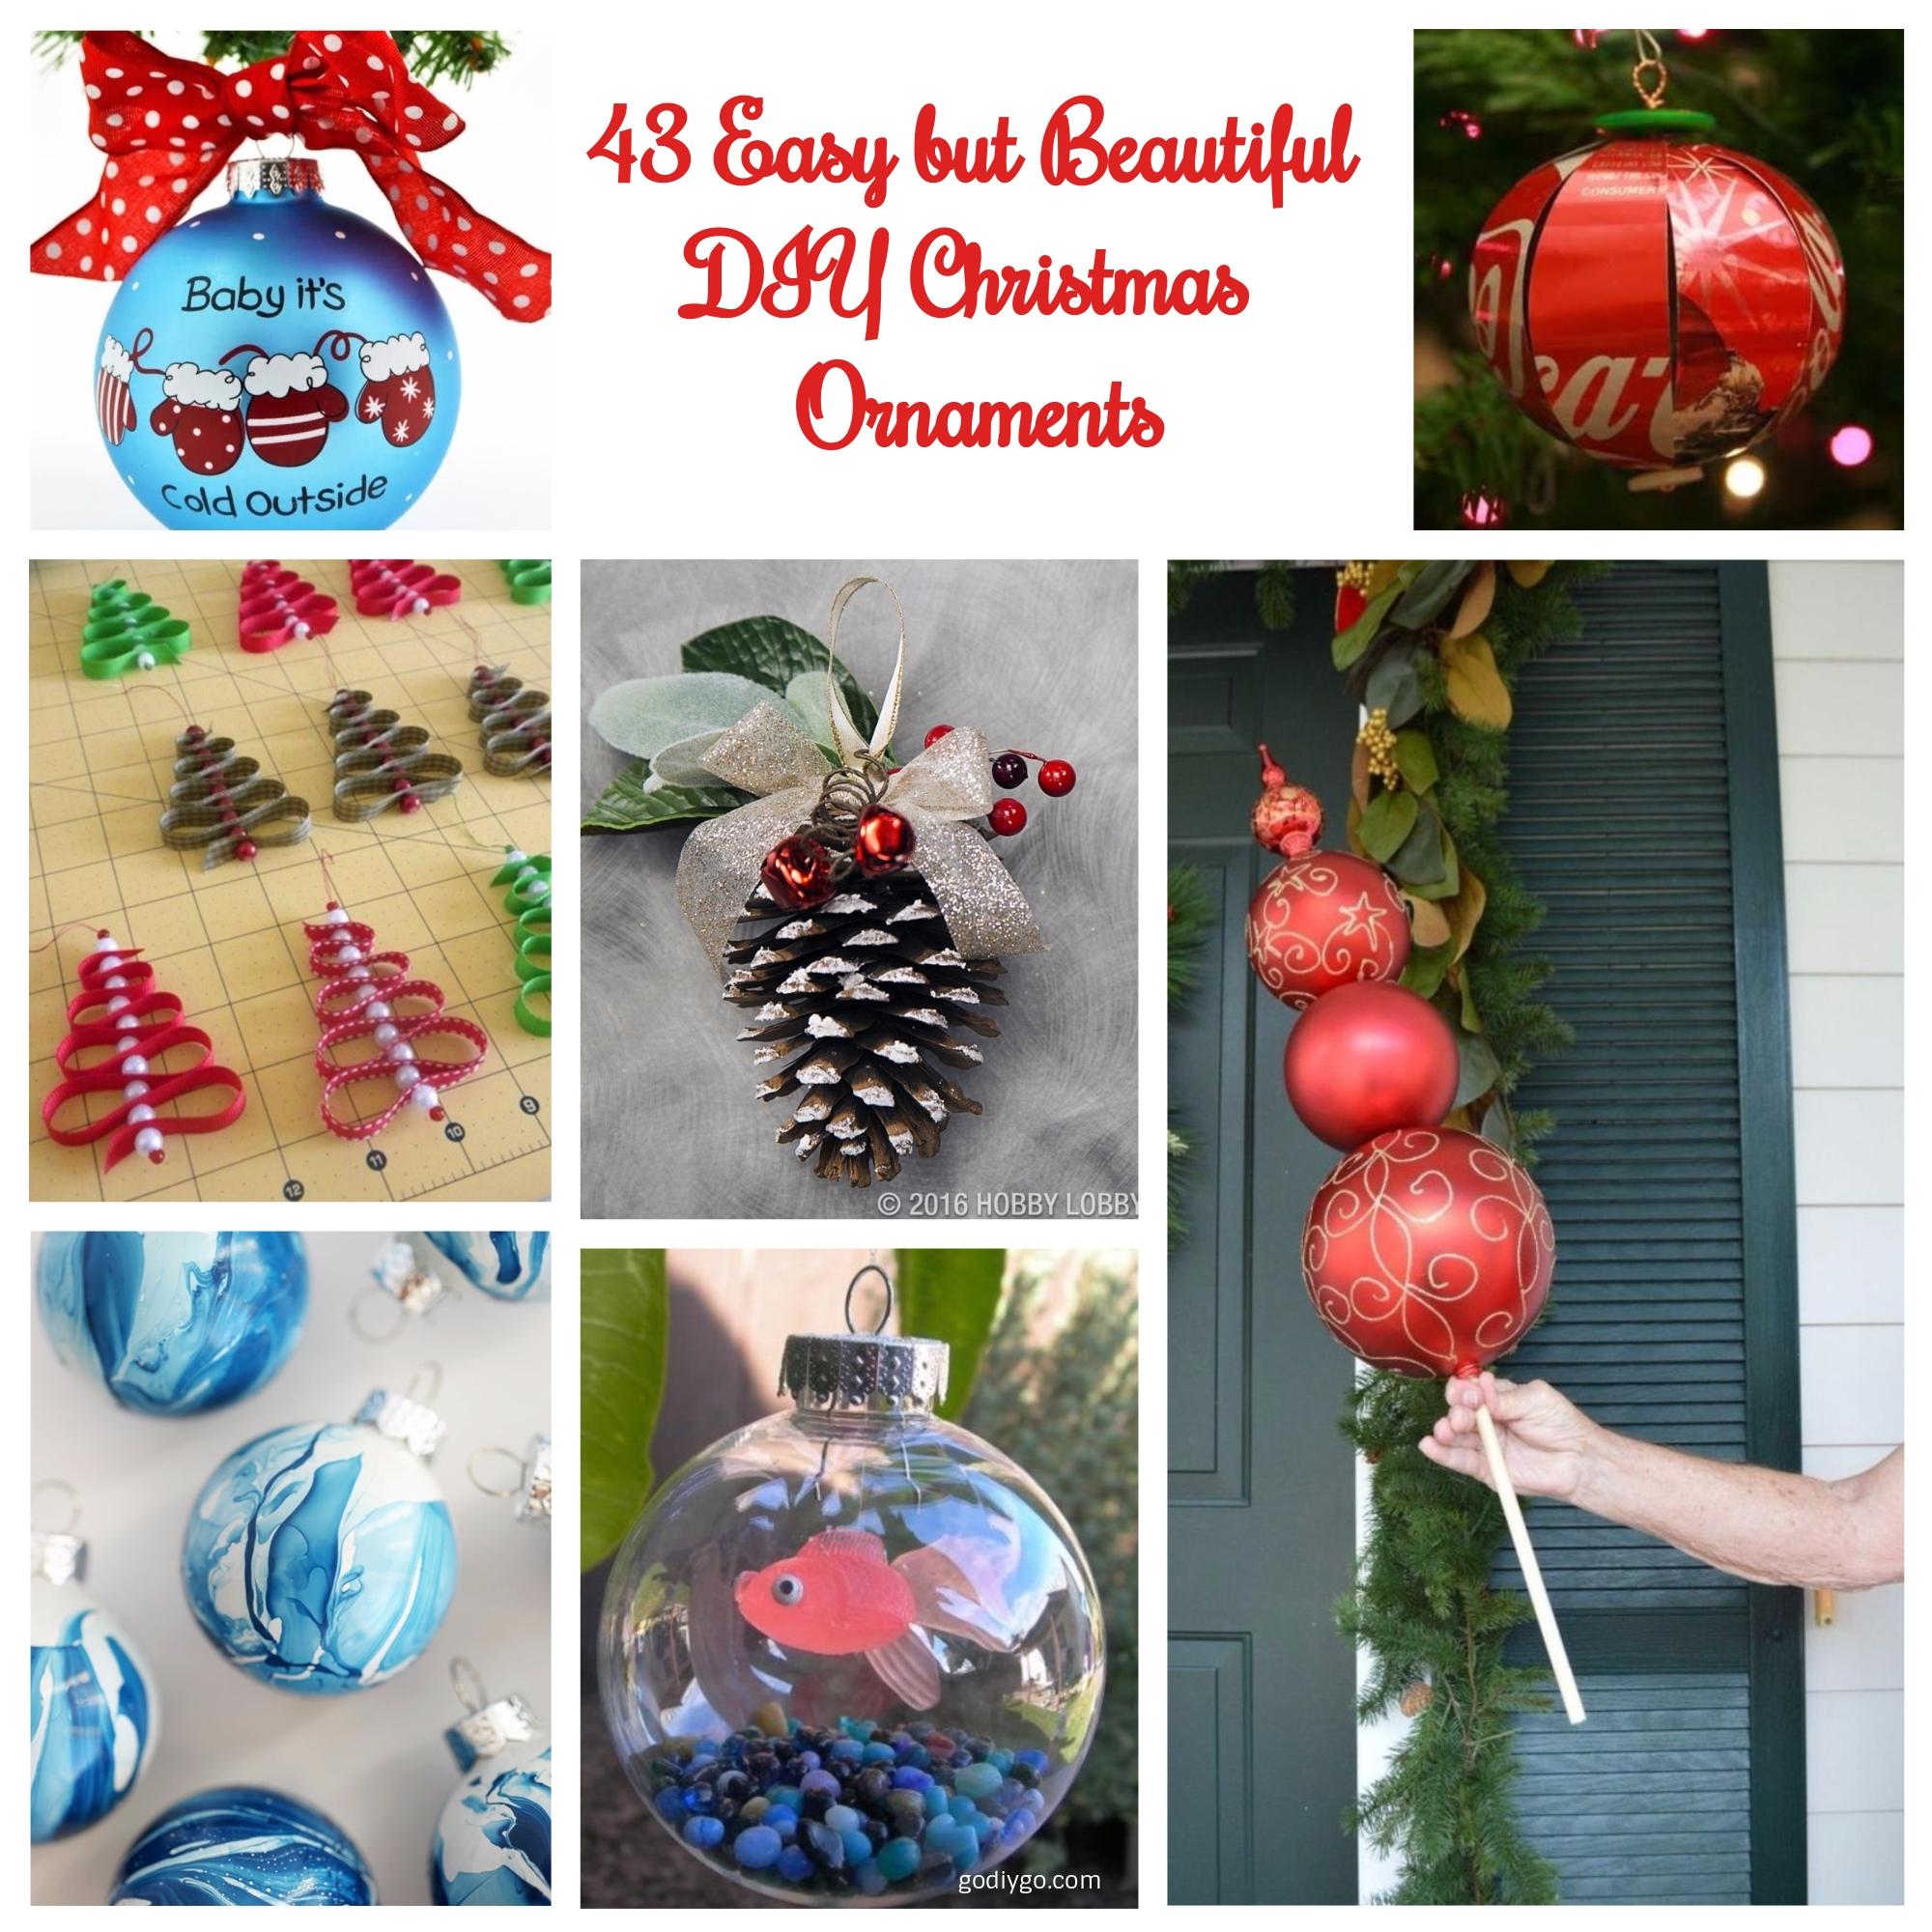 43 Easy but Beautiful DIY Christmas Ornaments - GODIYGO.COM